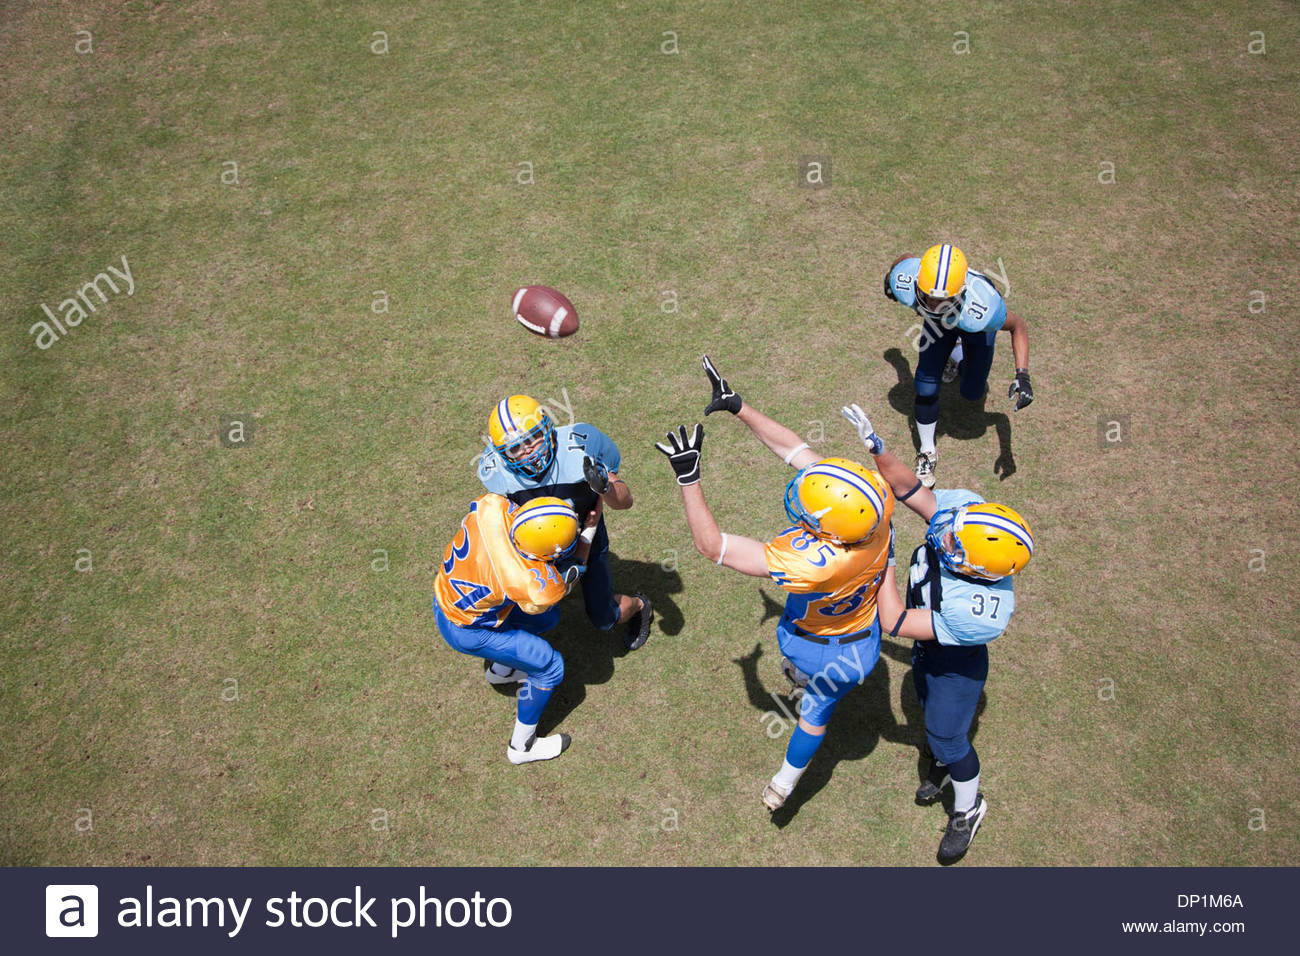 Joueur de football jouer au football Photo Stock